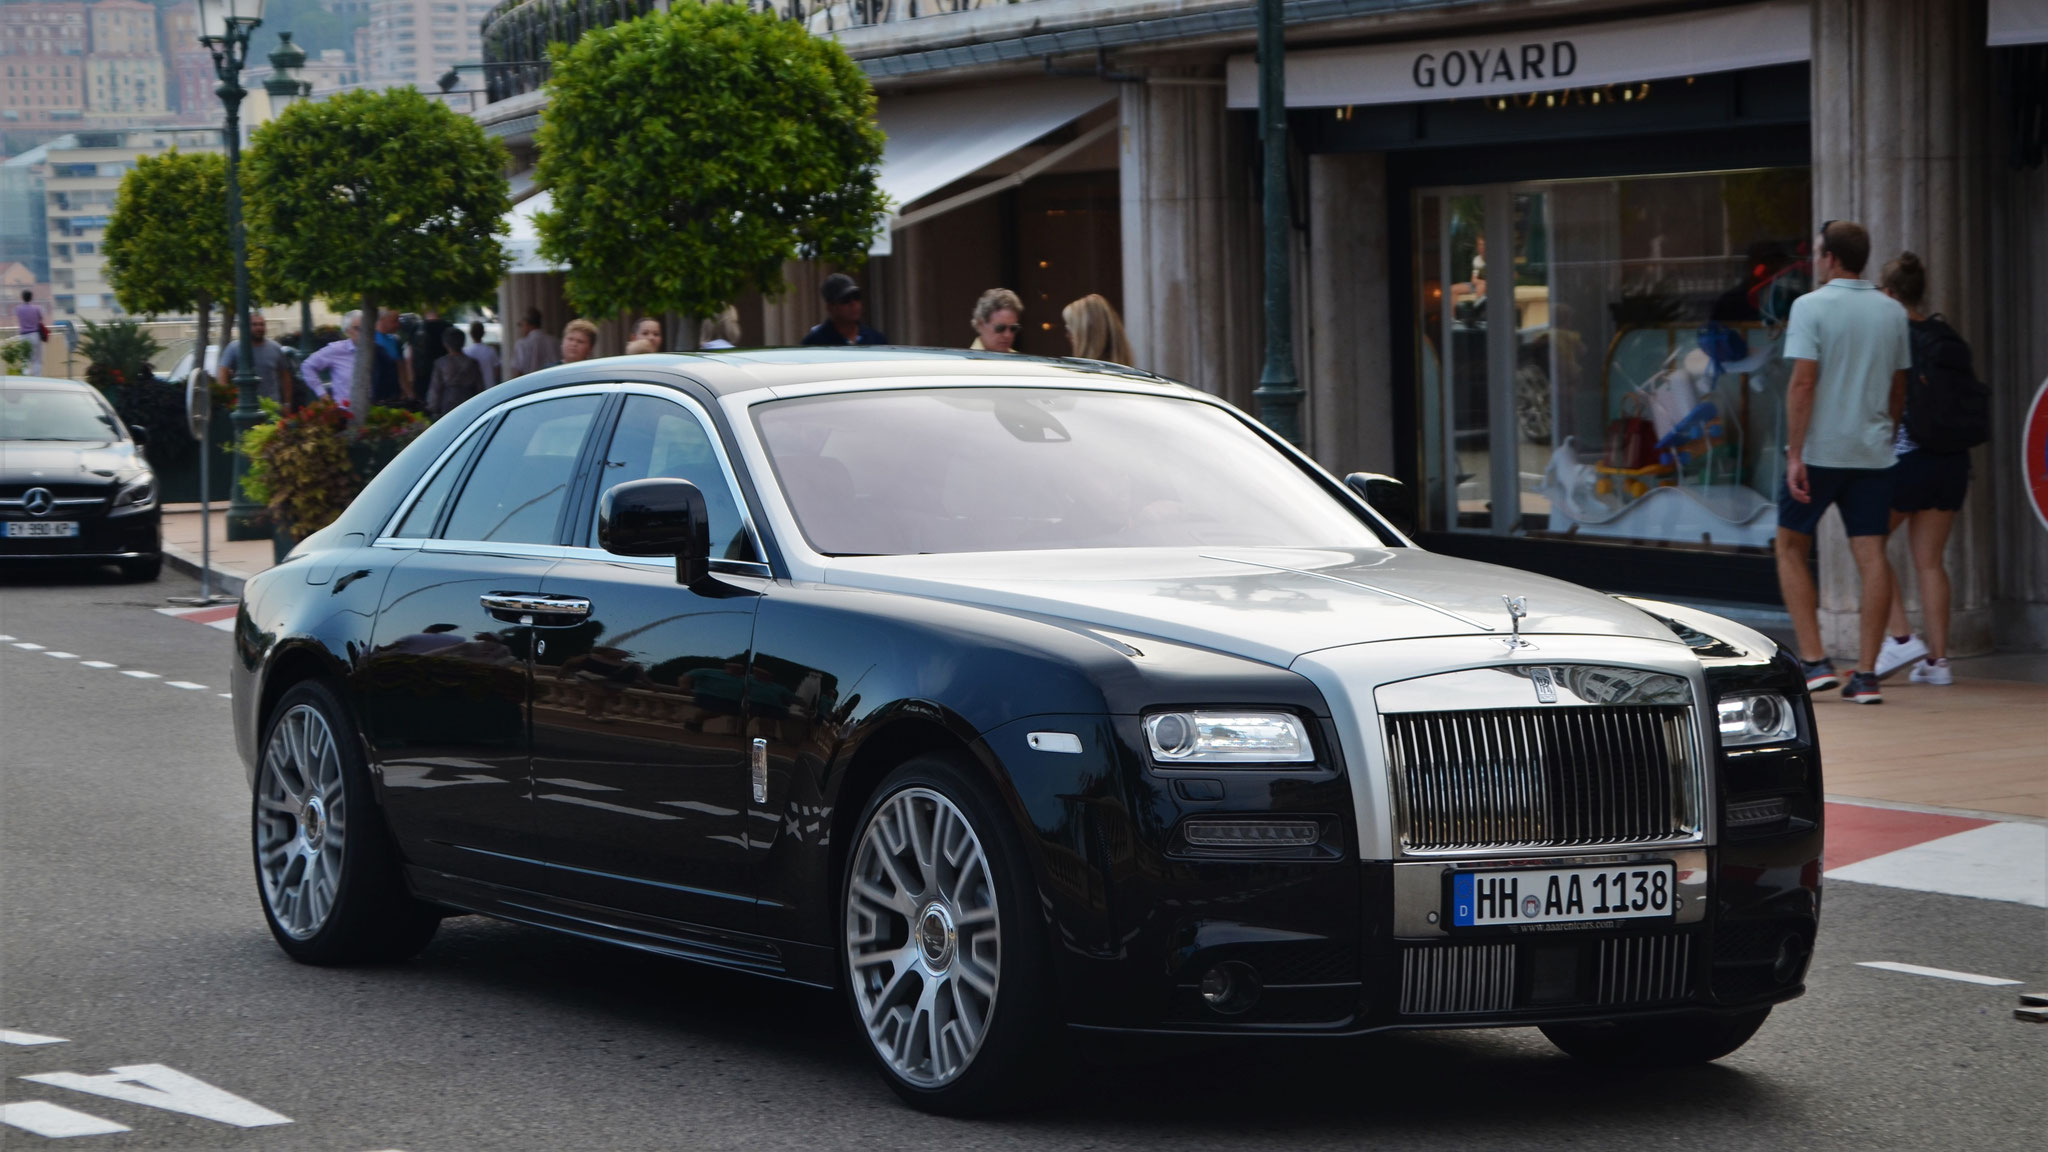 Rolls Royce Ghost Mansory - HH-AA-1138